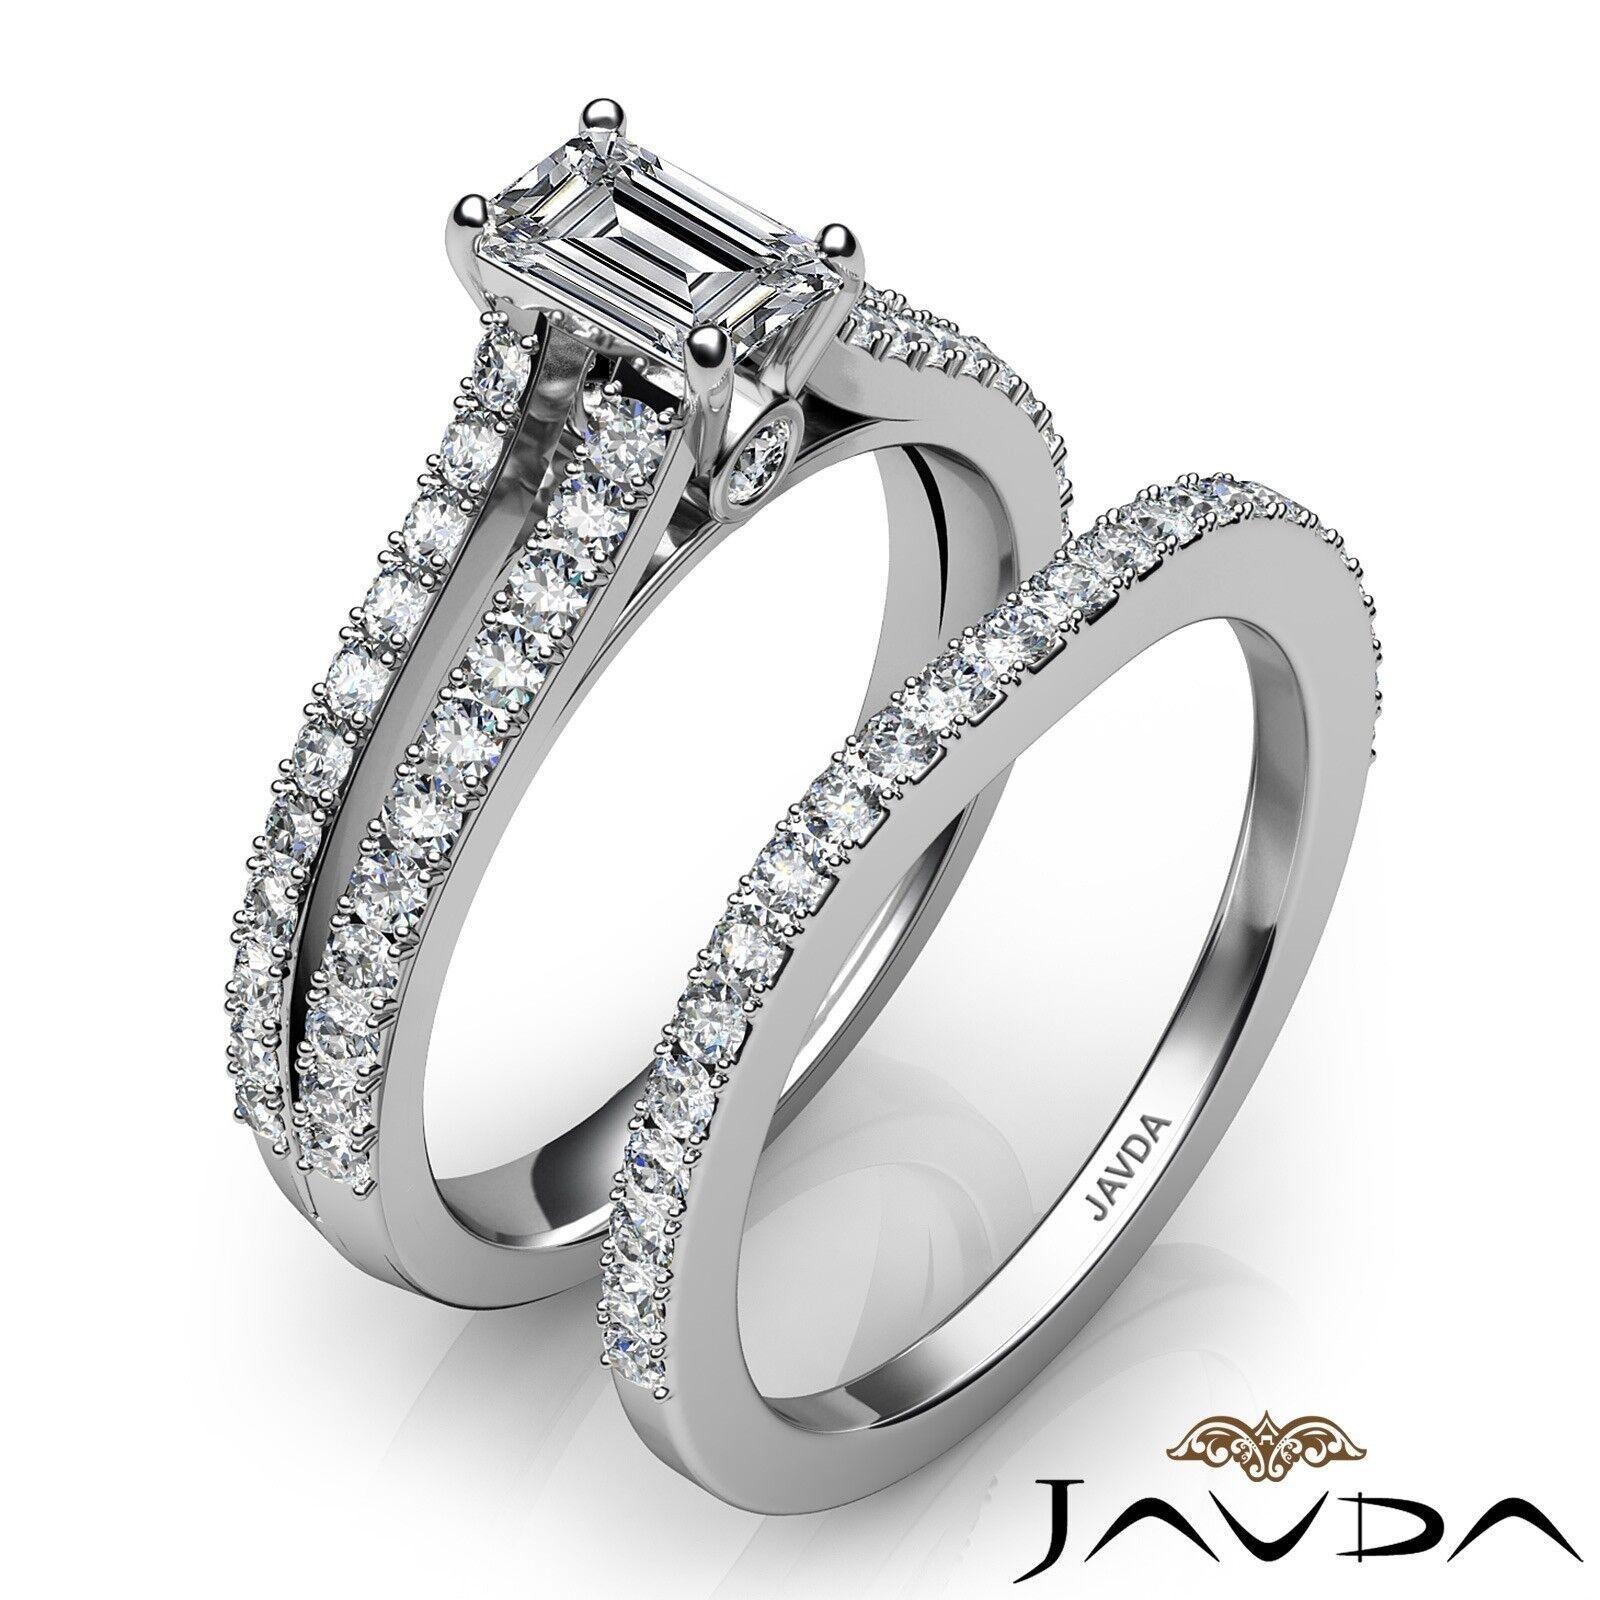 1.51ctw Split Shank Bezel Bridal Set Emerald Diamond Engagement Ring GIA E-VVS1 2